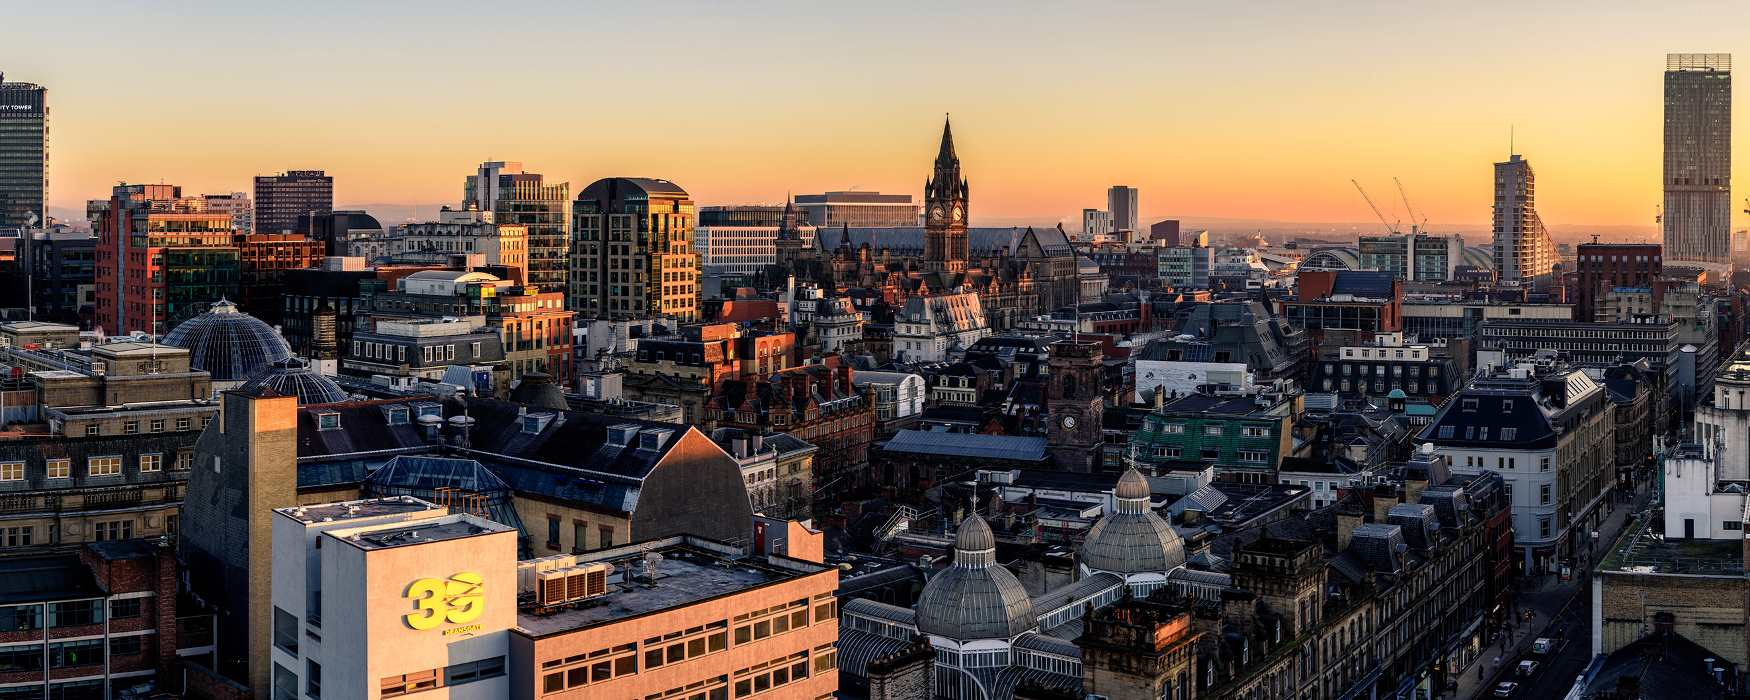 Manchester será la sede del IFHE Europe Conference 2019